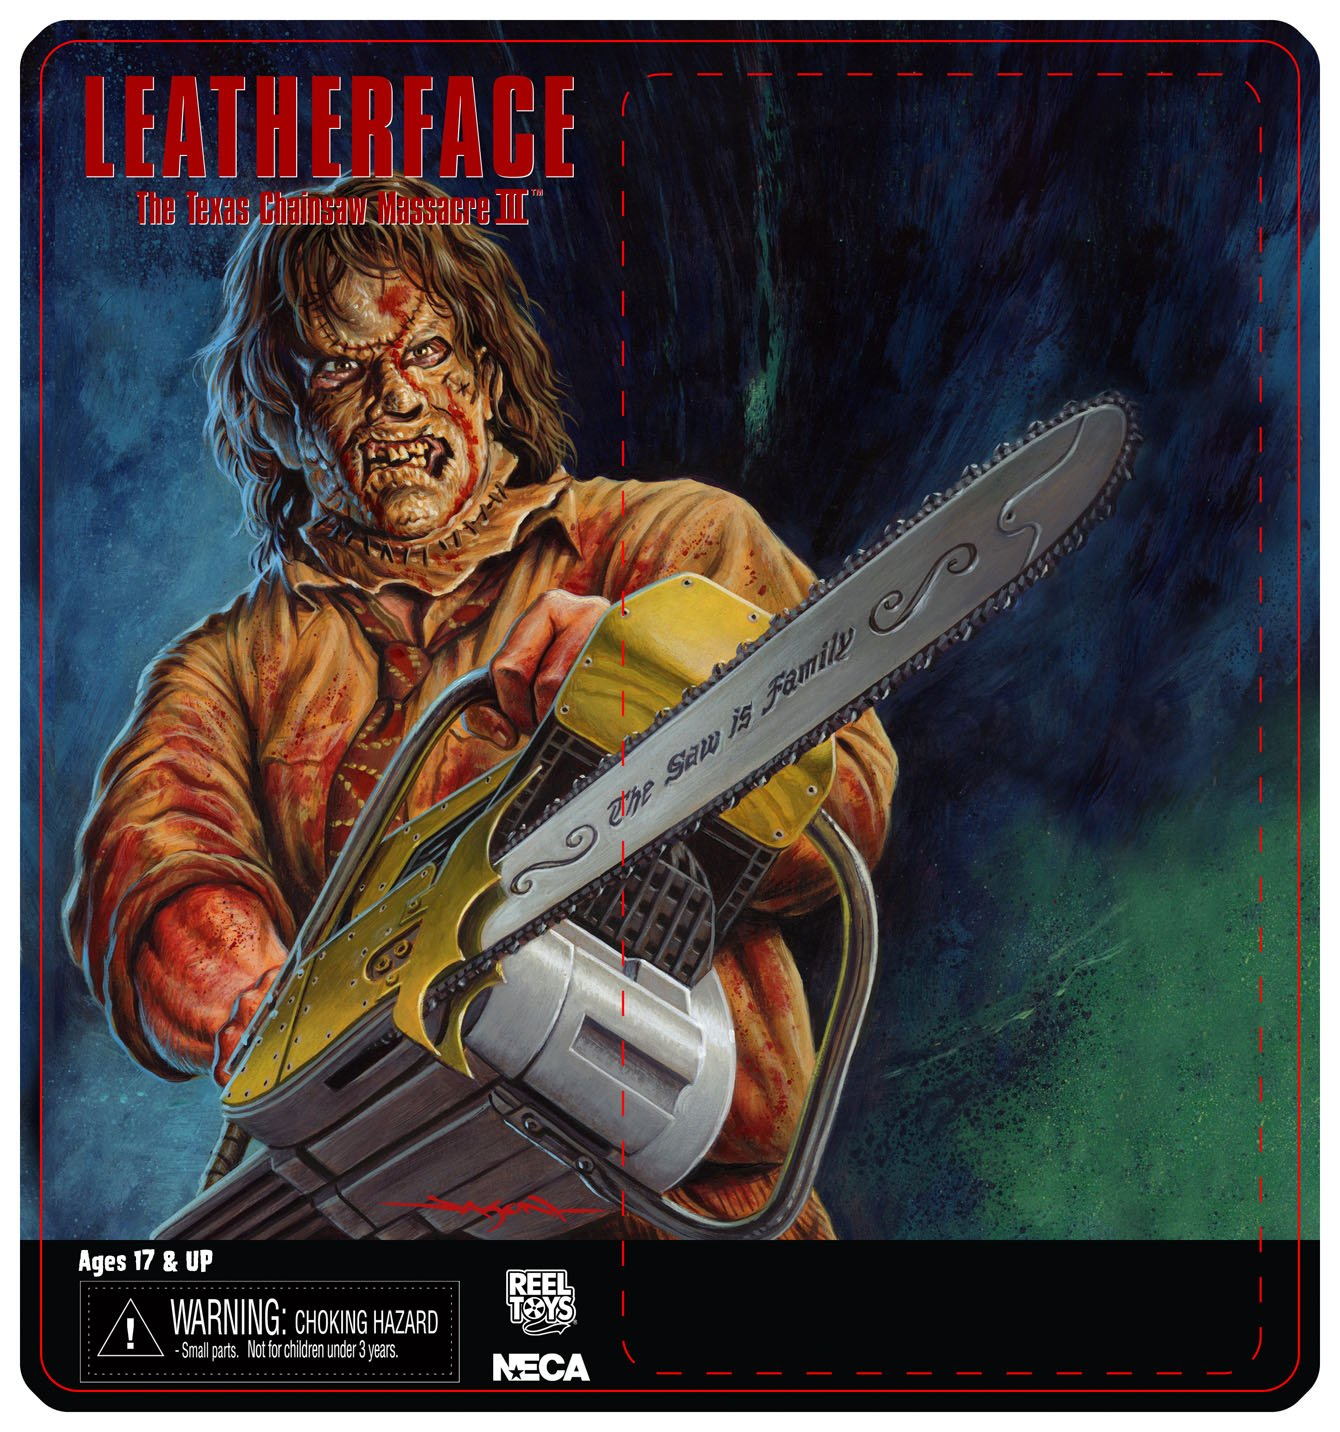 NECA Toys Leatherface: Texas Chainsaw Massacre 3 – 8″ Scale Leatherface Retro Mego Style Figure Card Art